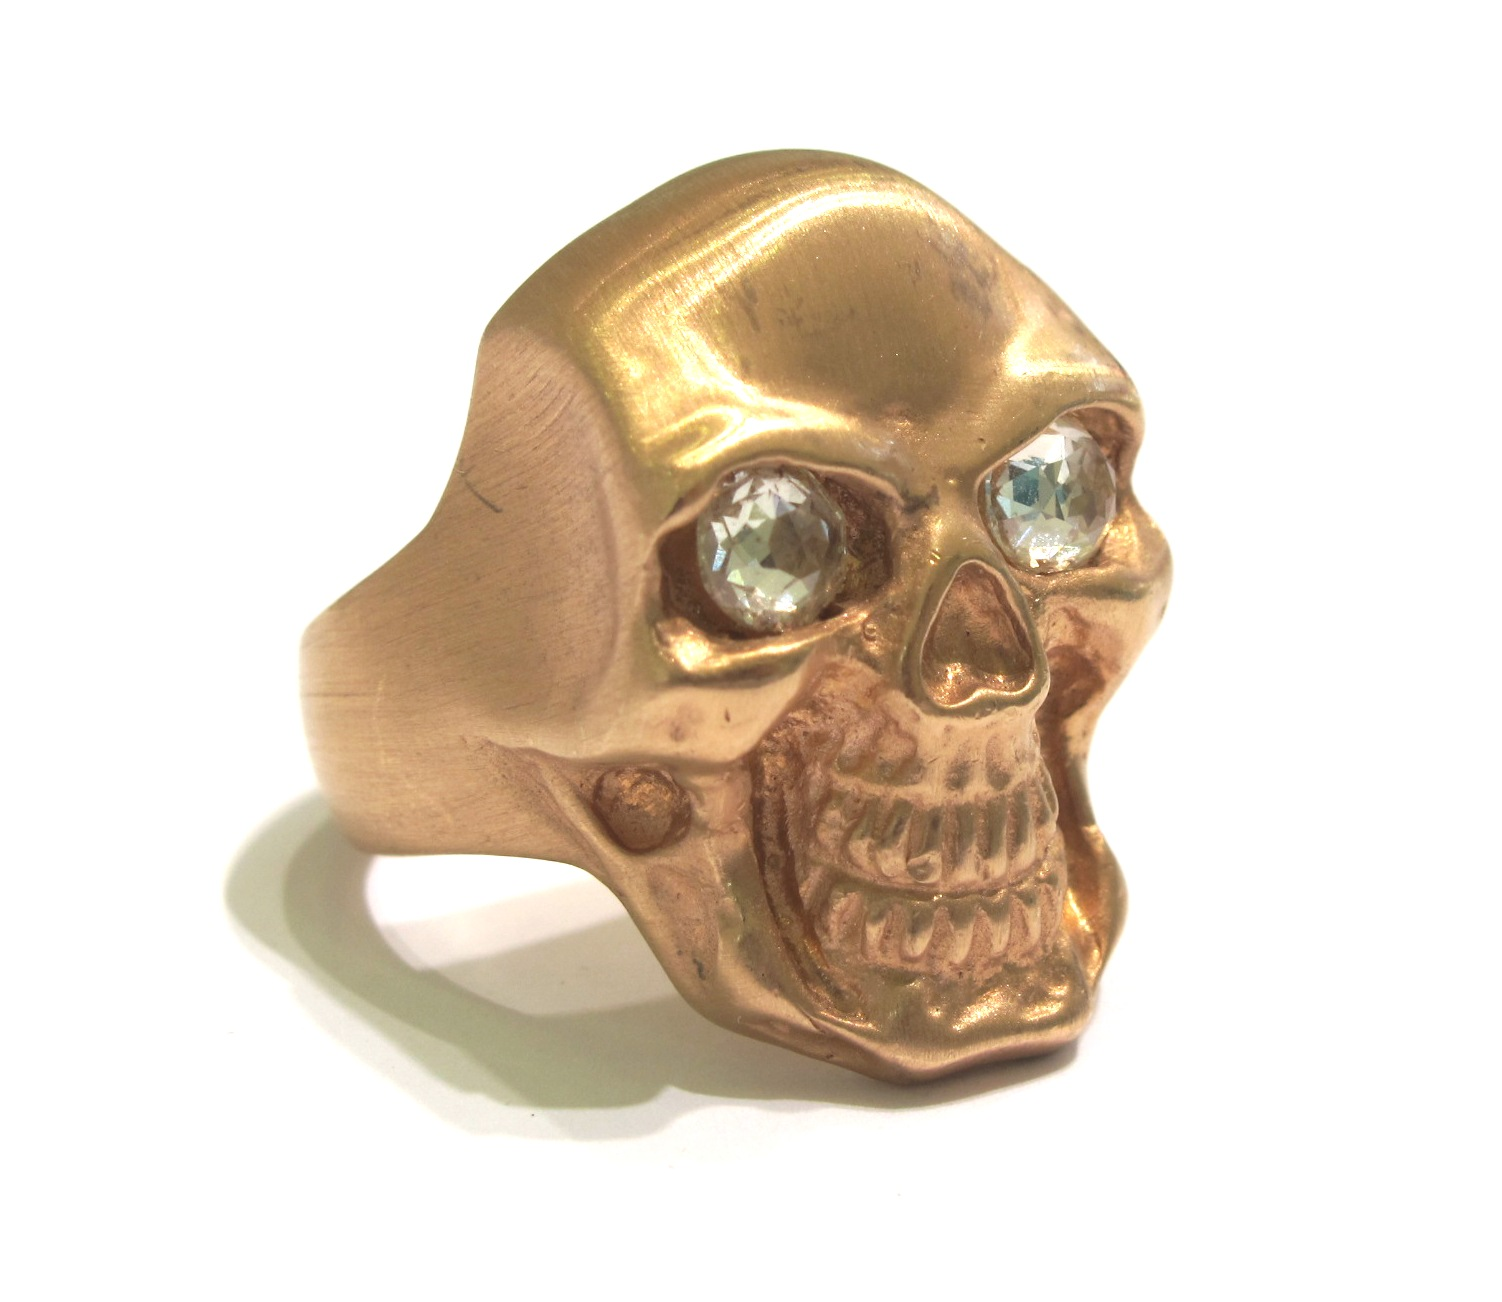 Pin Gold Skull Rings Pictures on Pinterest